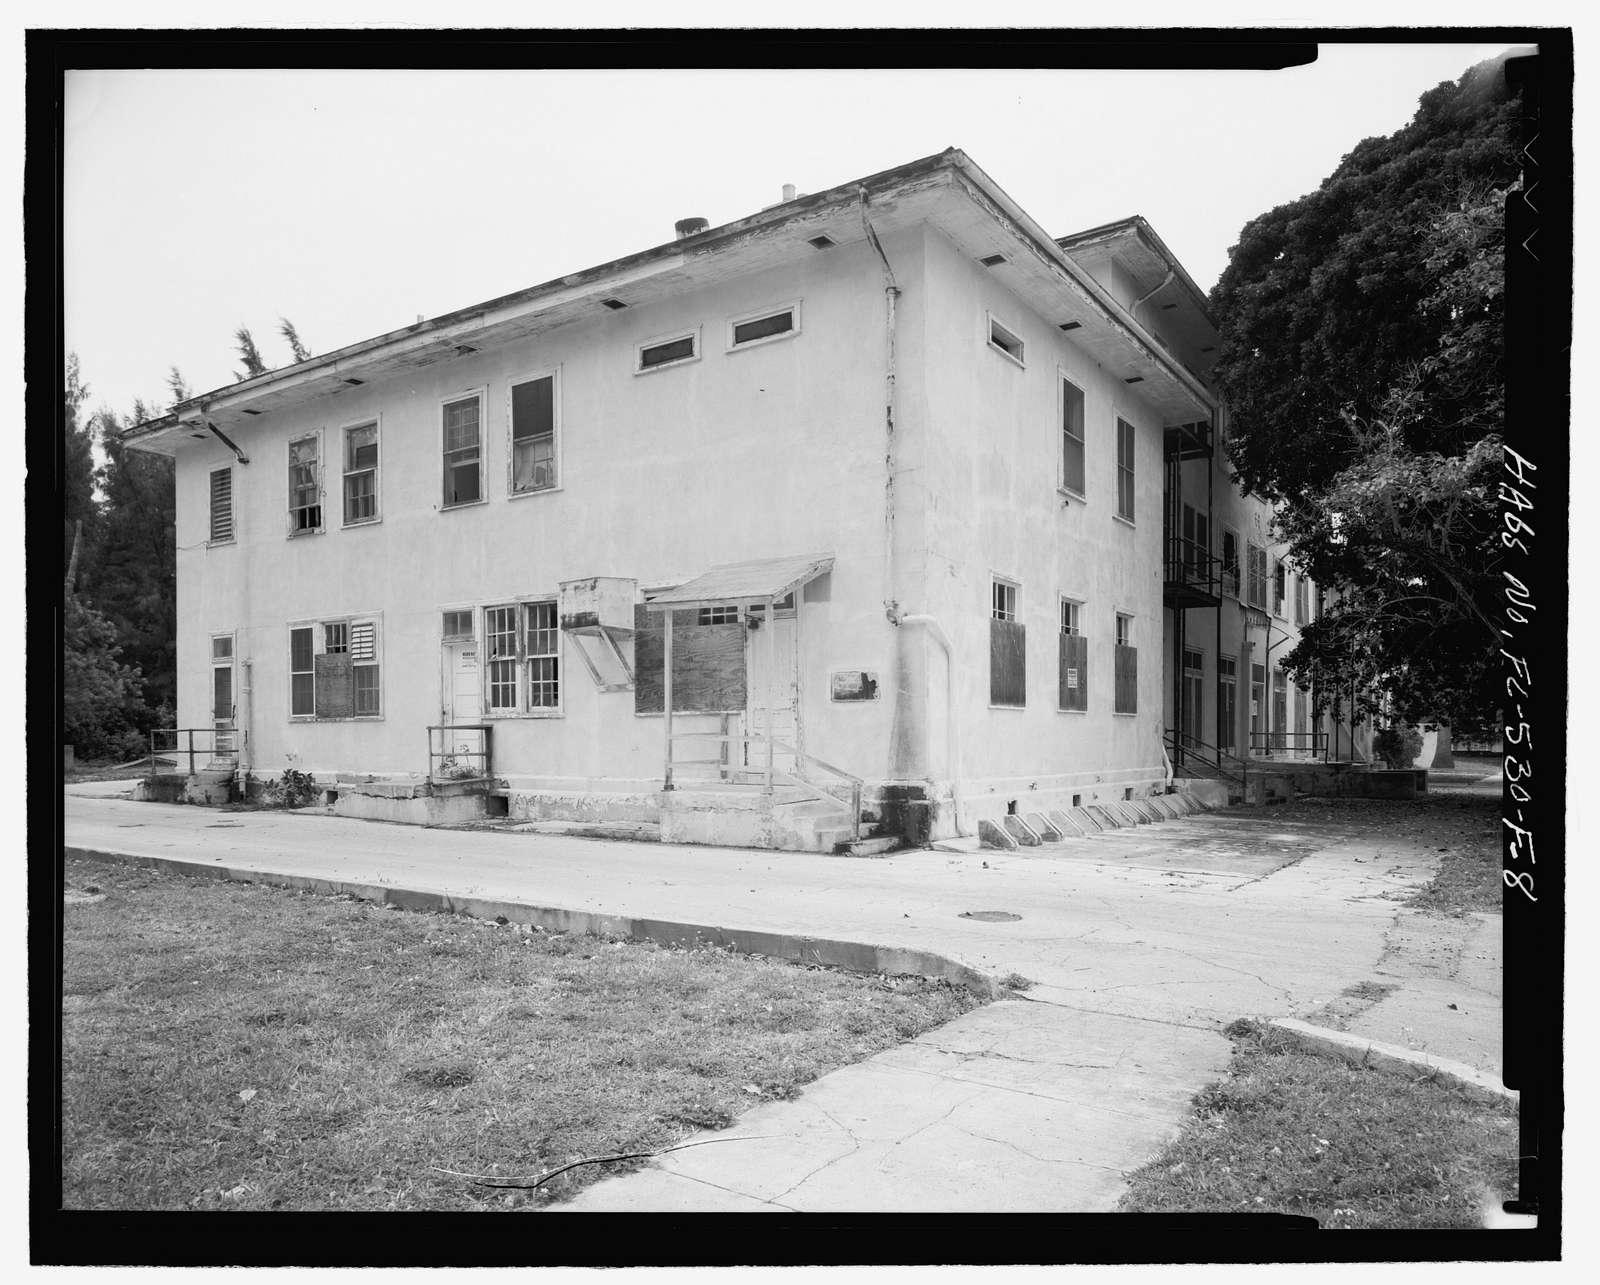 Naval Air Station Key West, Truman Annex, Seaman's Barracks, Key West, Monroe County, FL